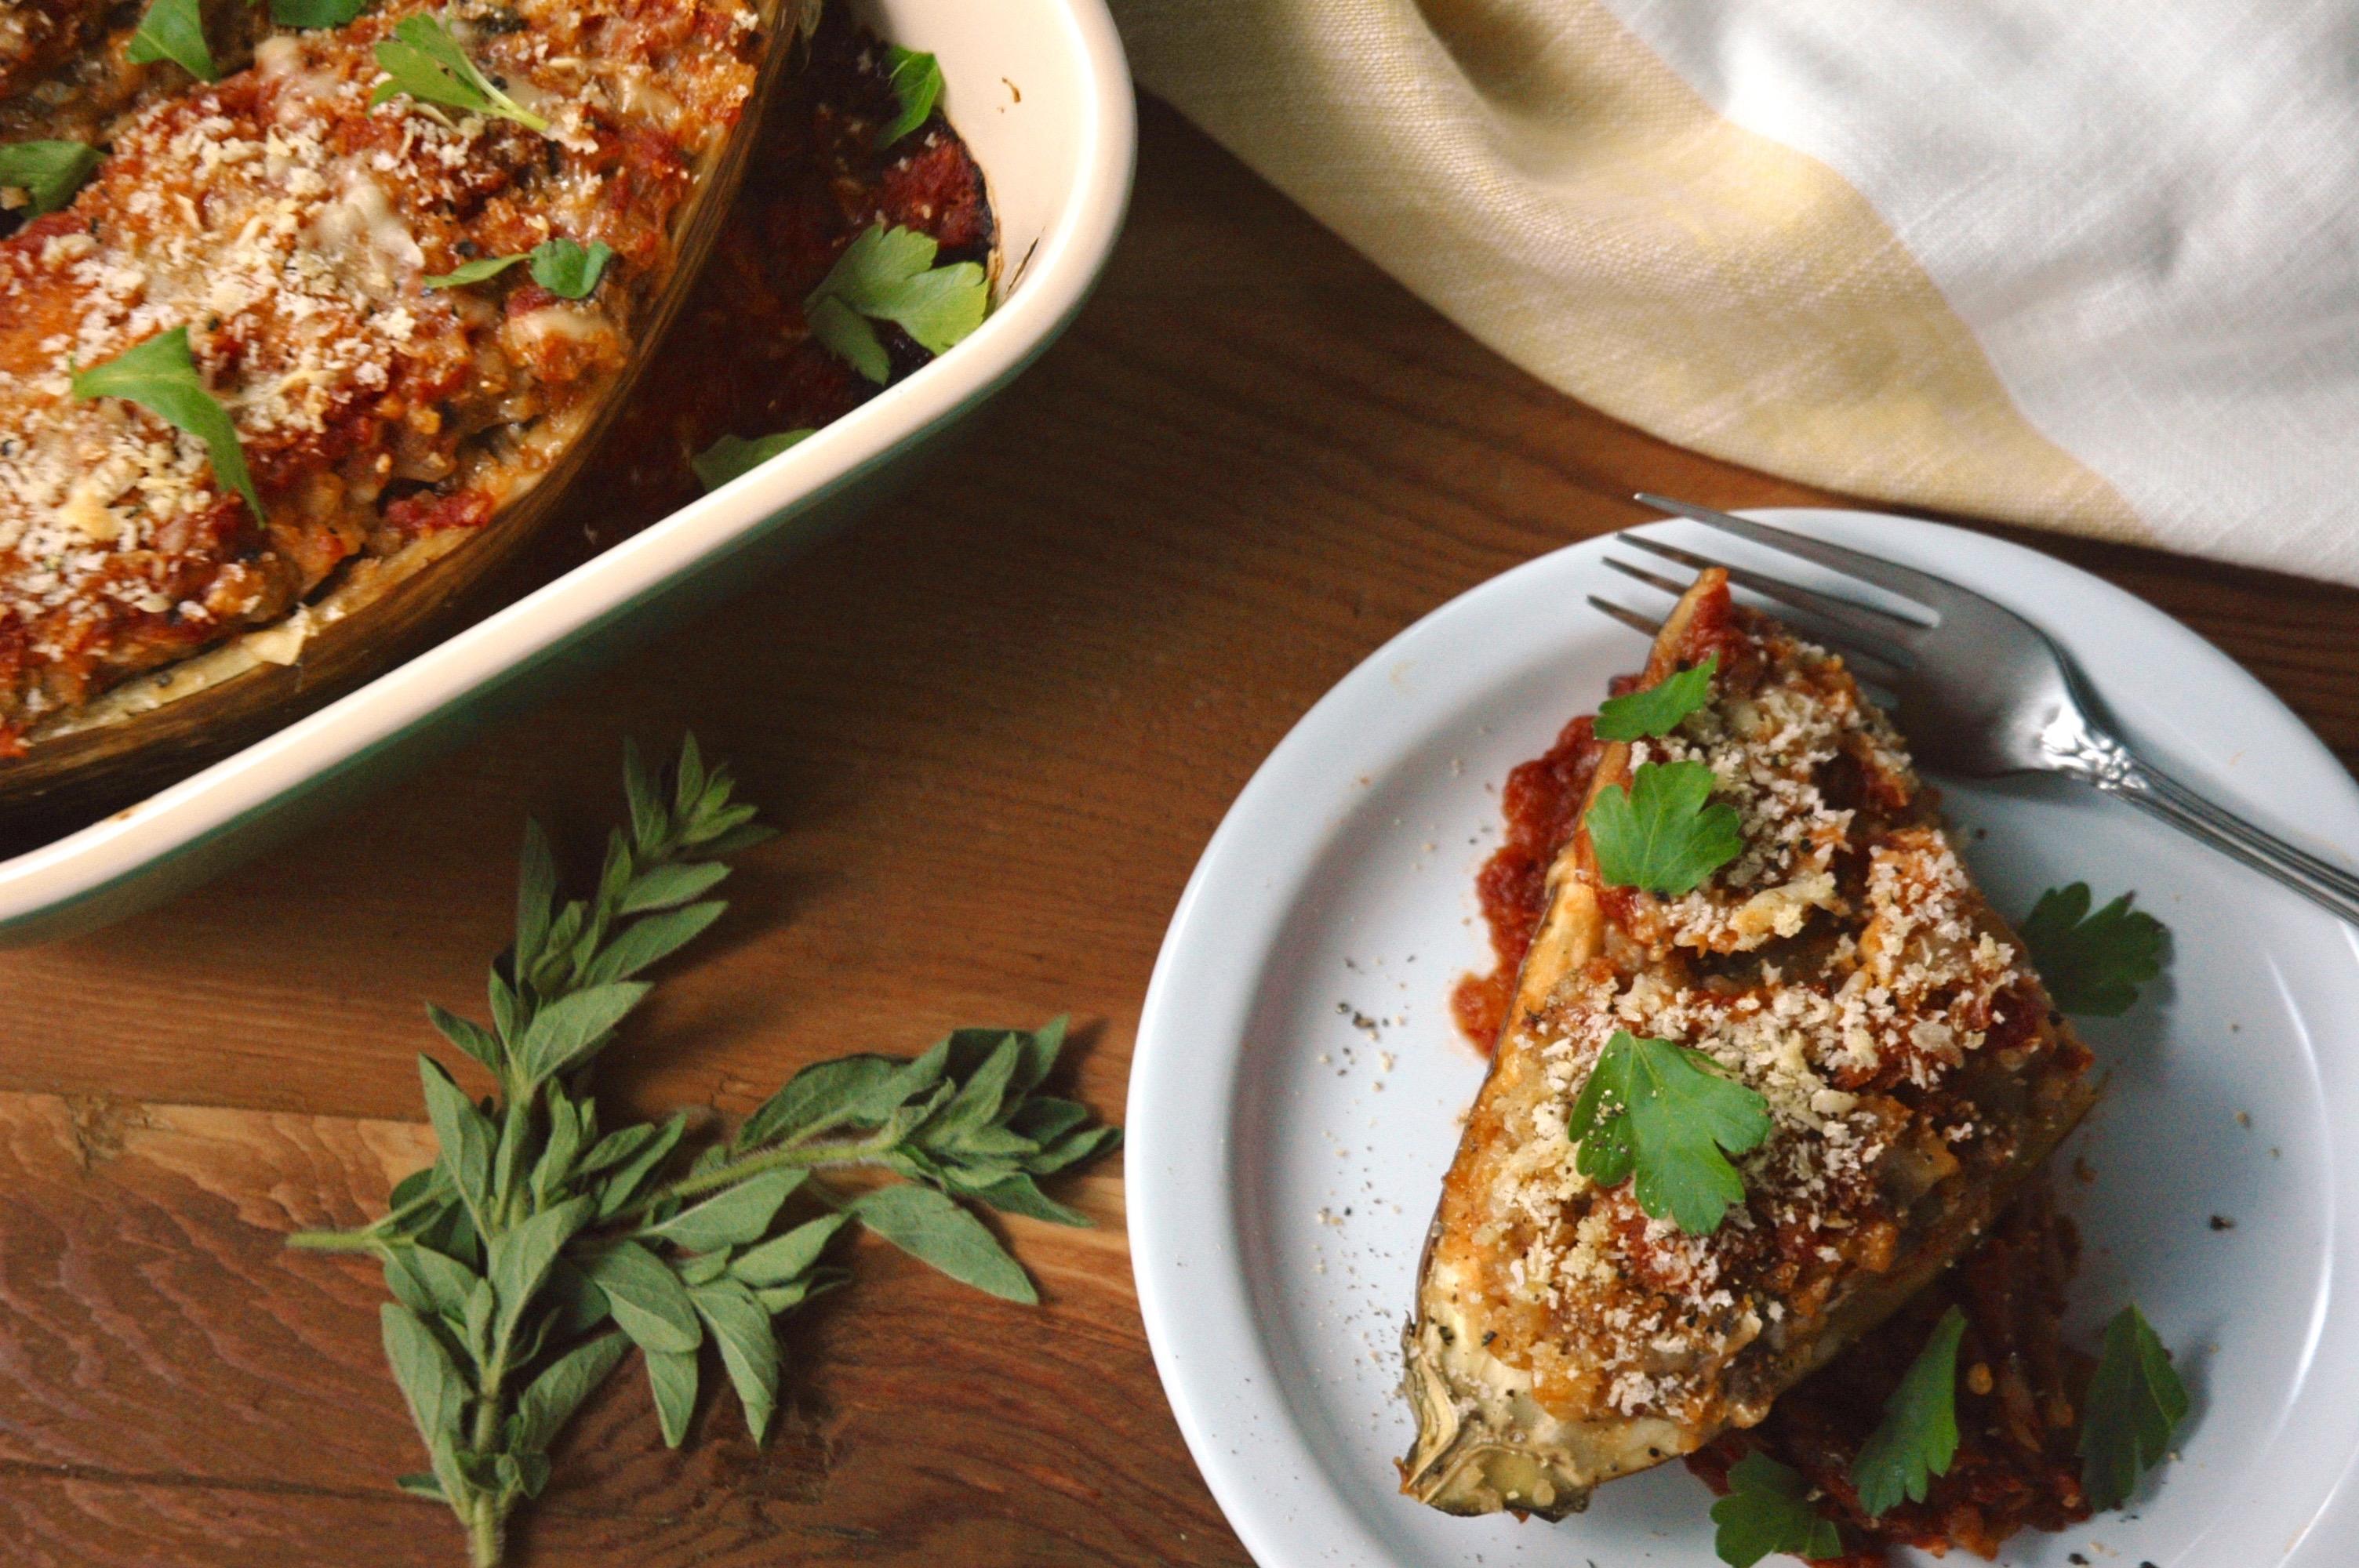 Arancini-Stuffed Baked Eggplant